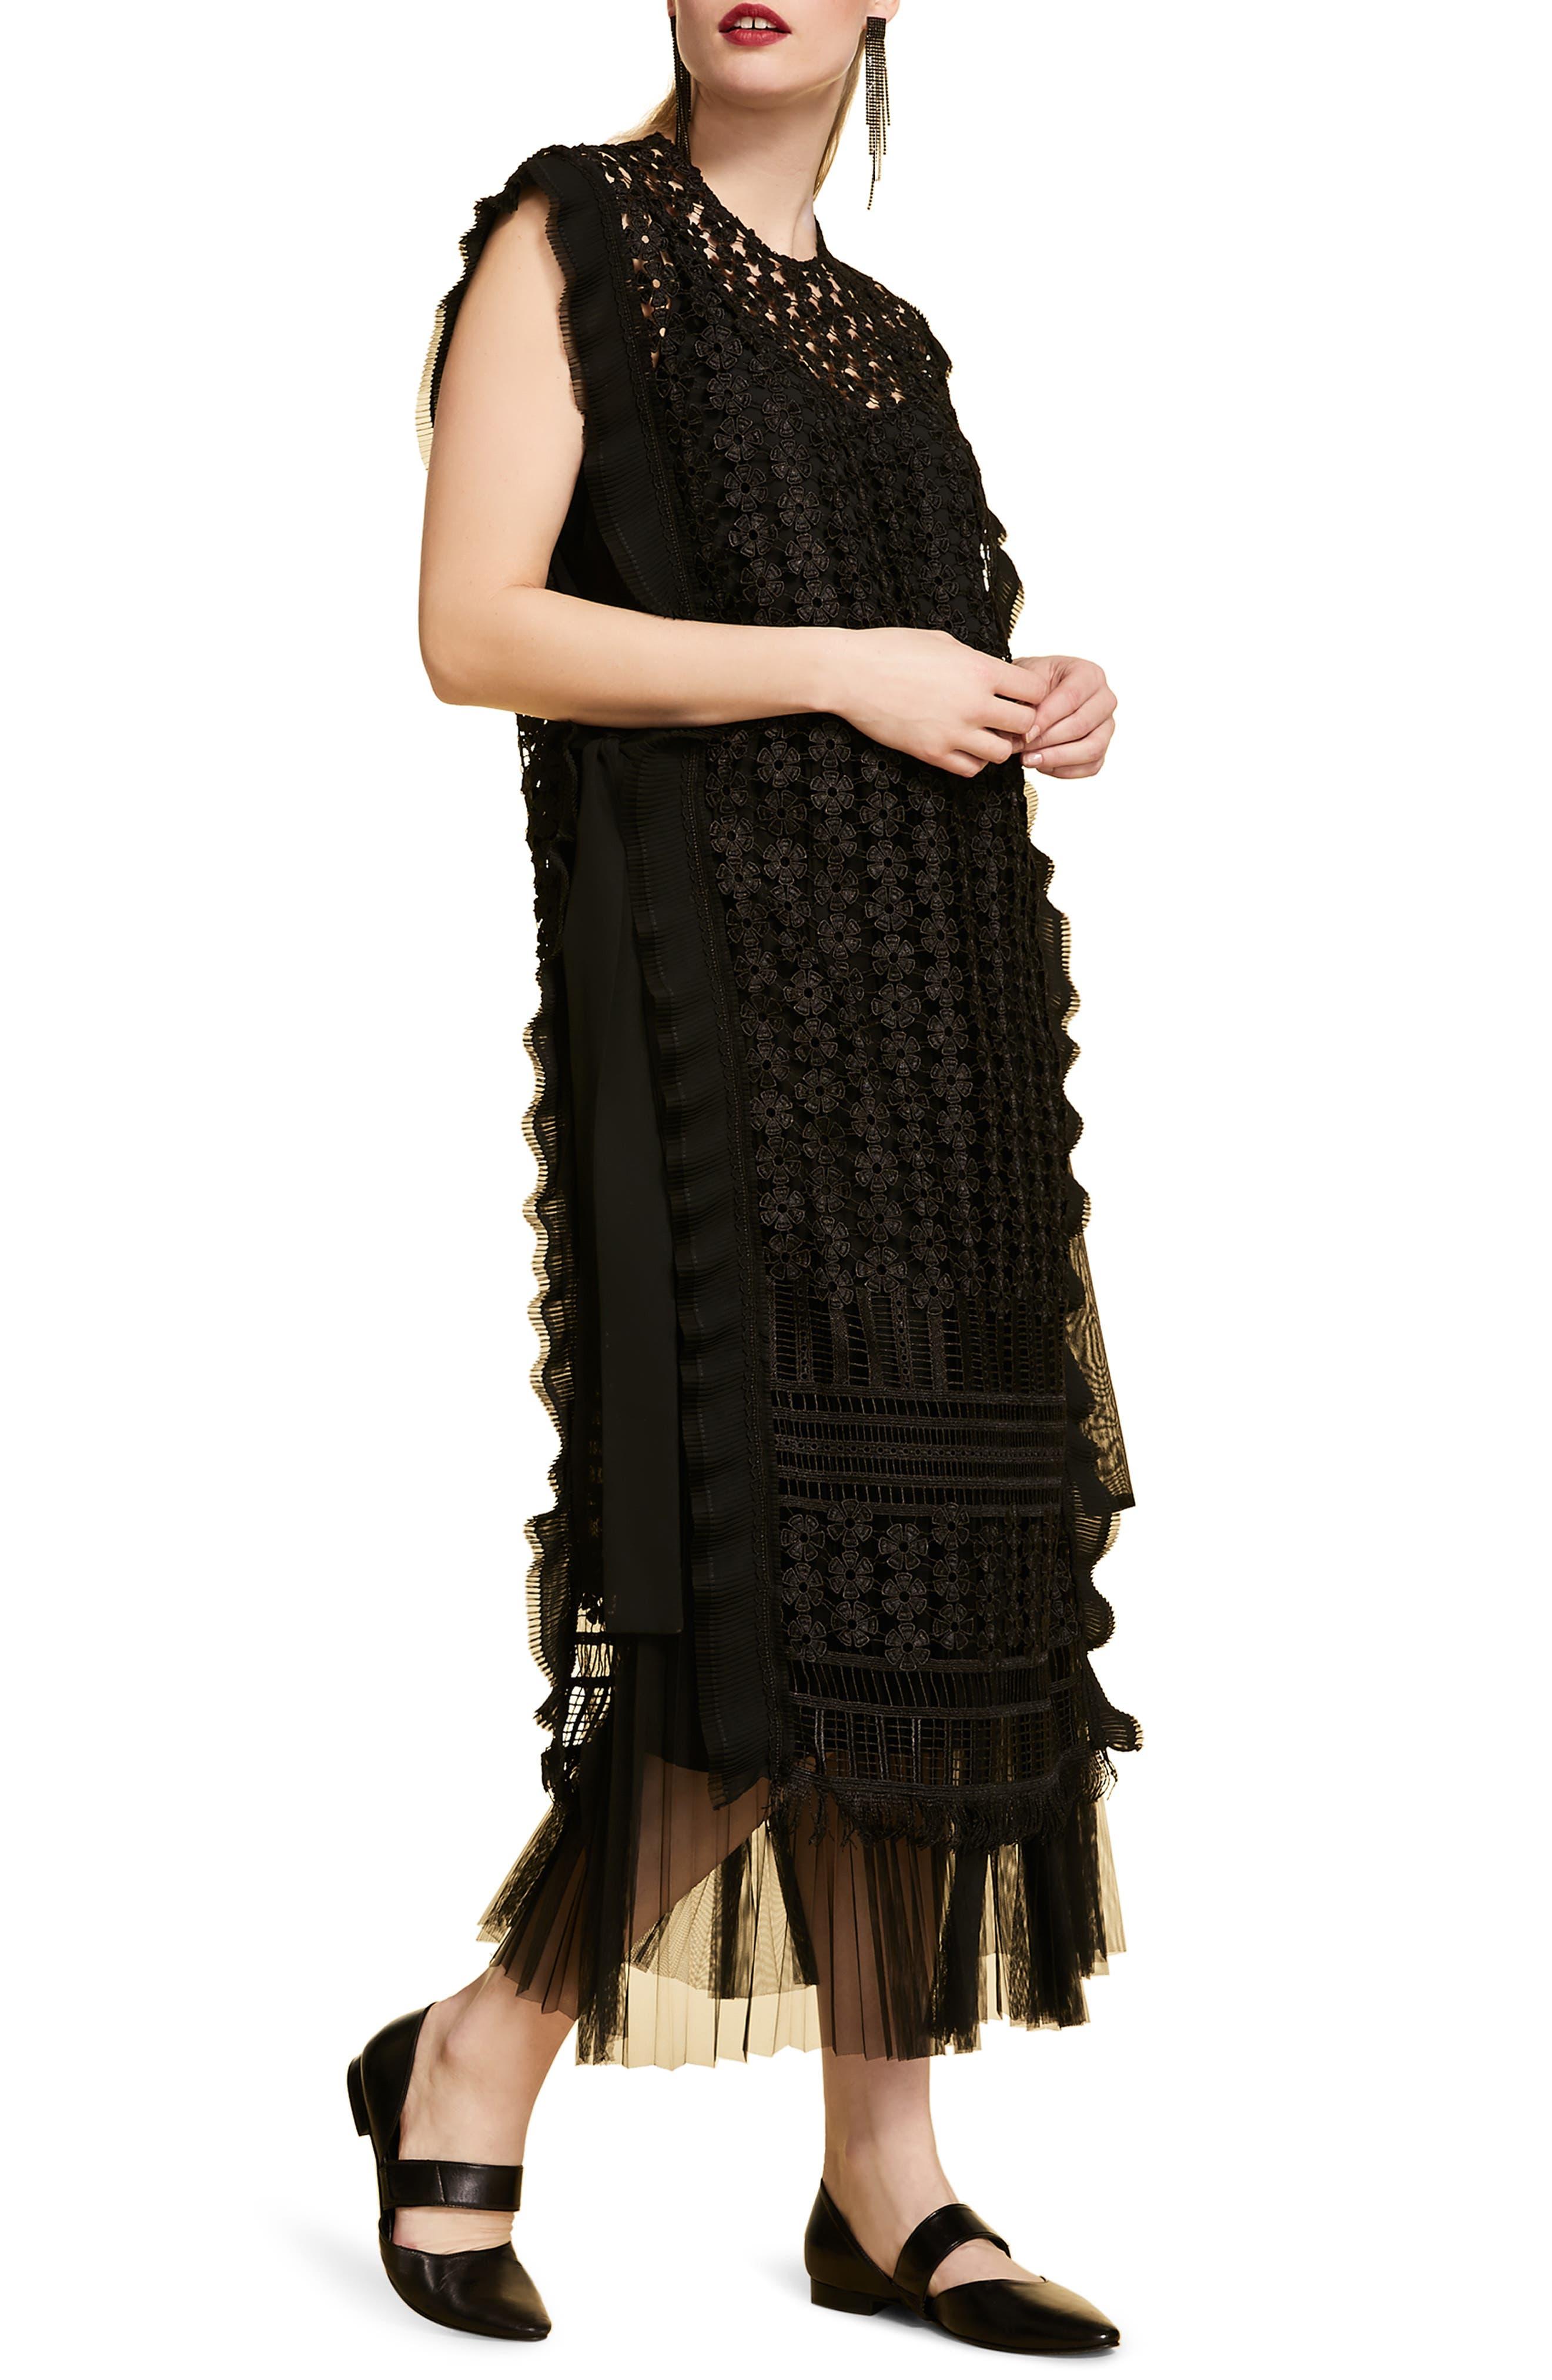 Plus Size Marina Rinaldi Deciso Lace & Tulle Maxi Dress, Black